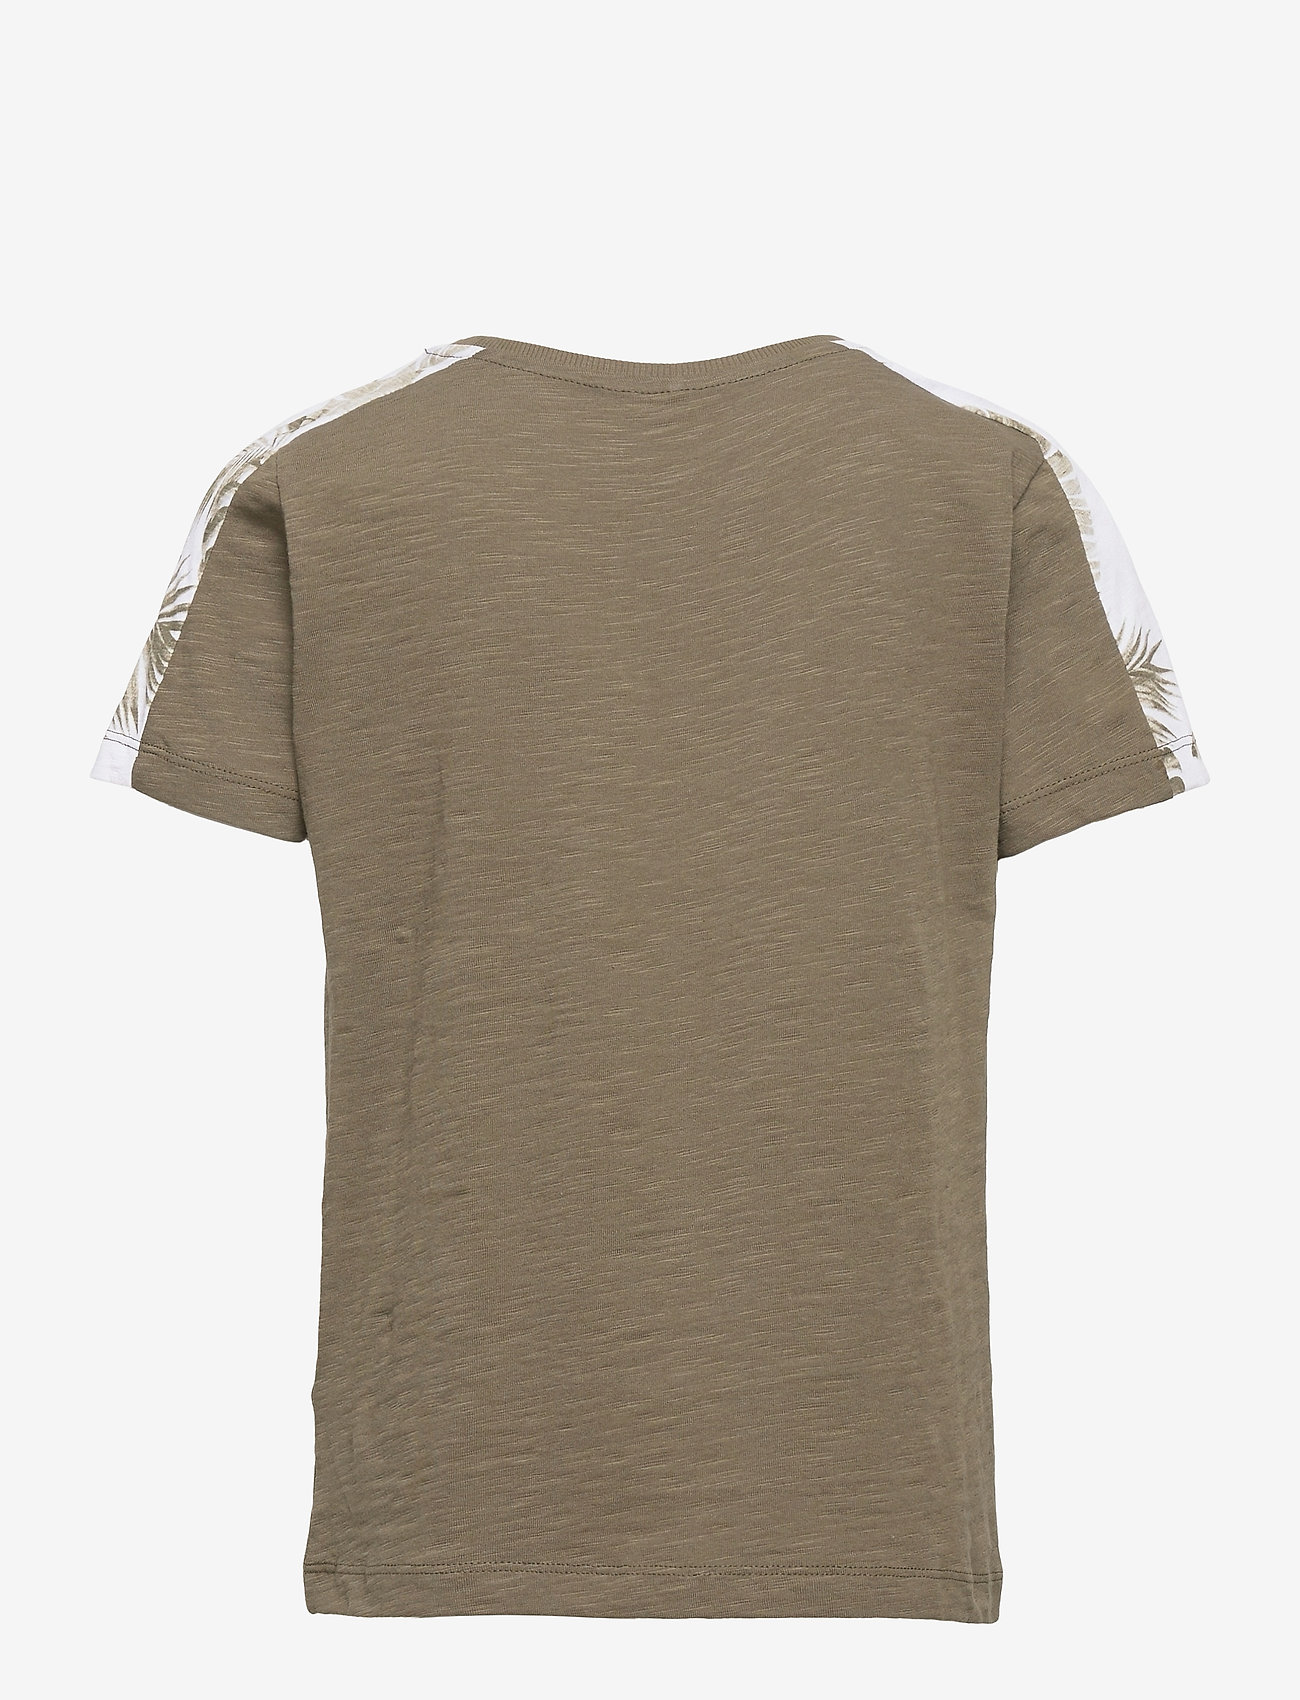 name it - NKMHAILOM SS TOP - t-shirts - ivy green - 1